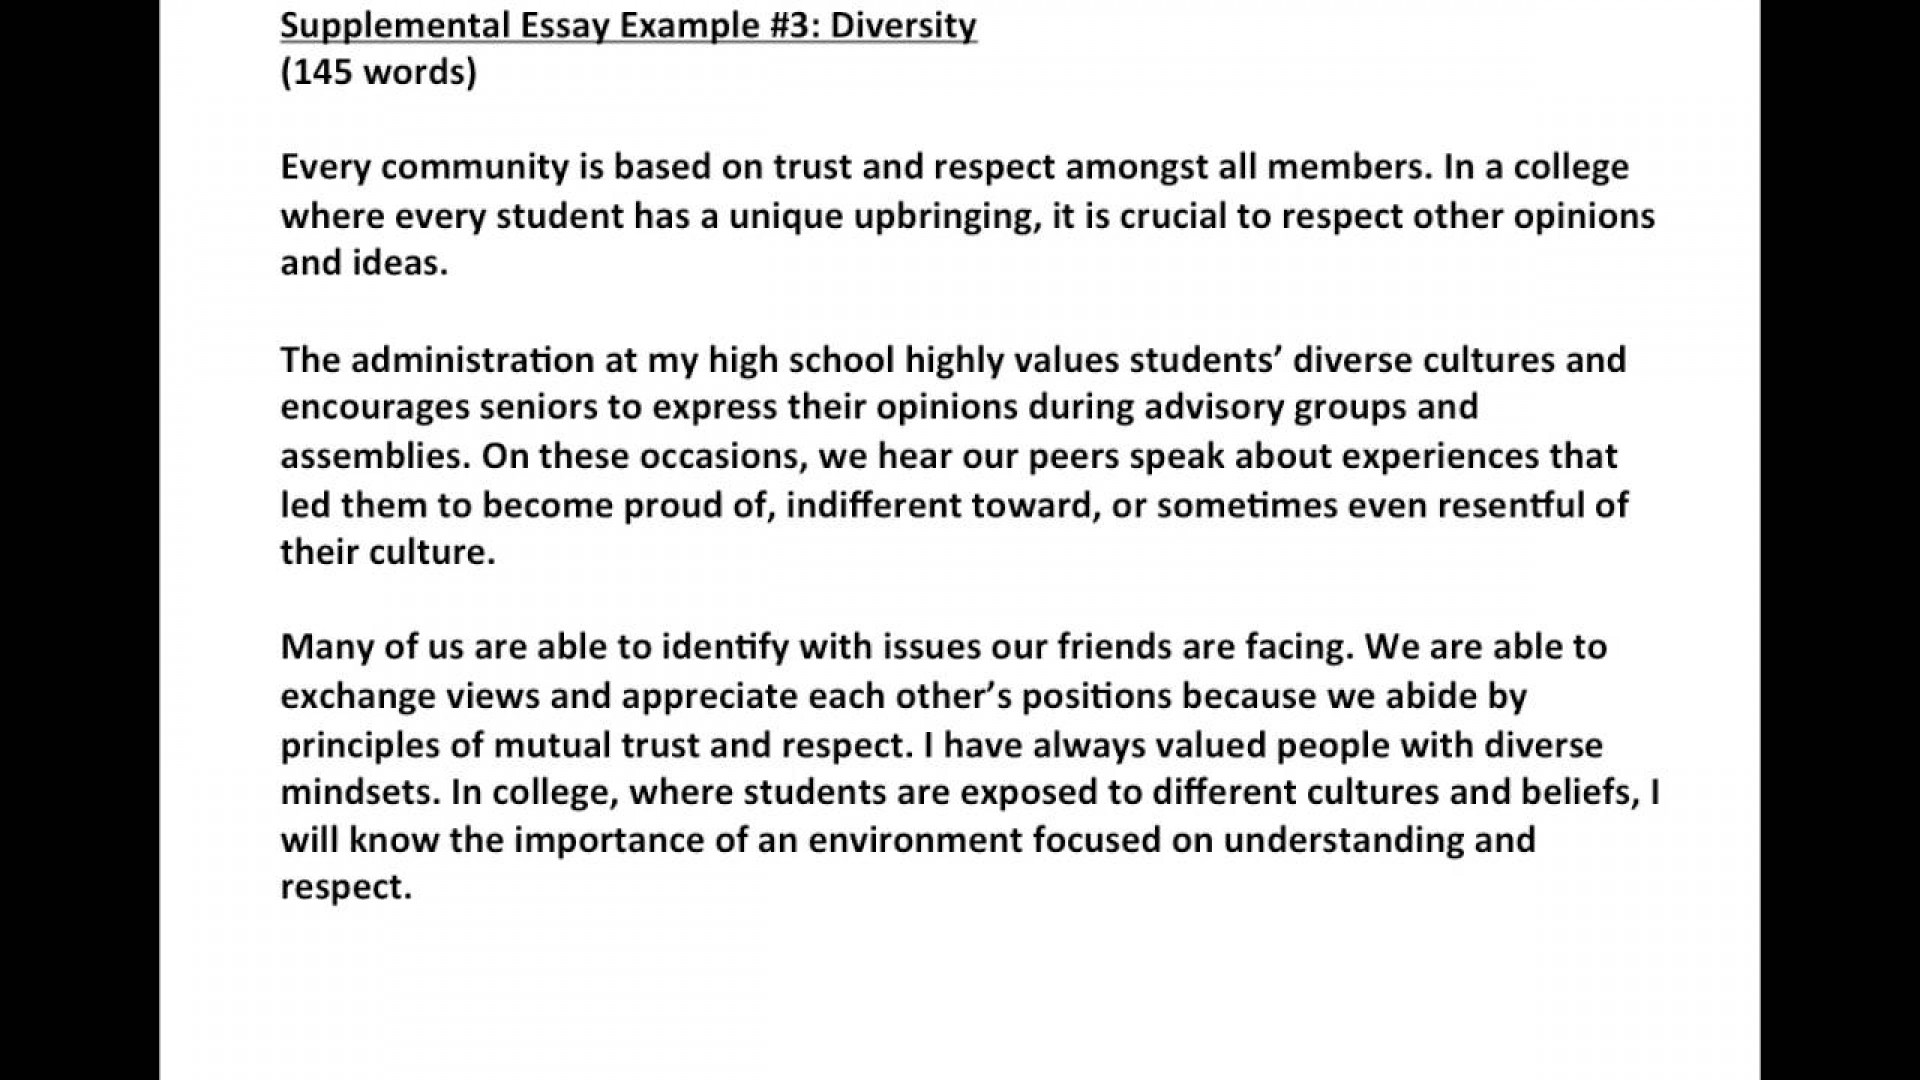 Downside of diversity essay